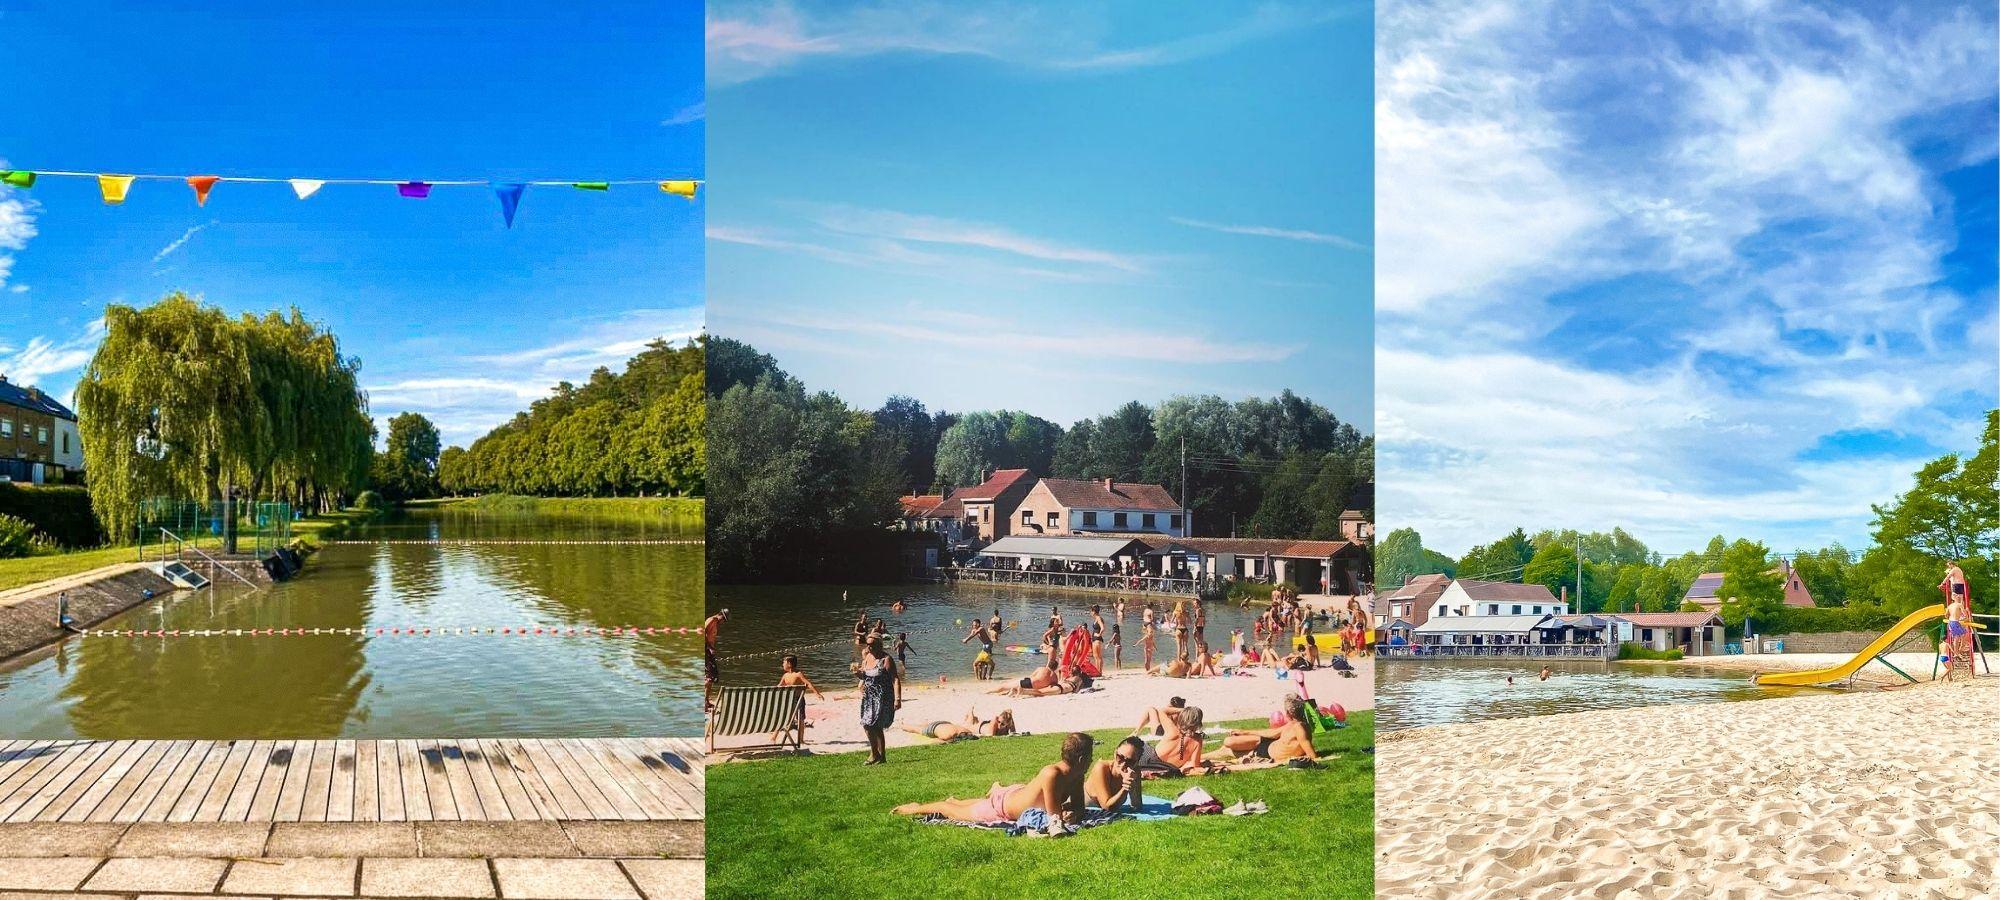 Groups of people sunbathing and swimming at Renipont Beach in Lasne, Belgium